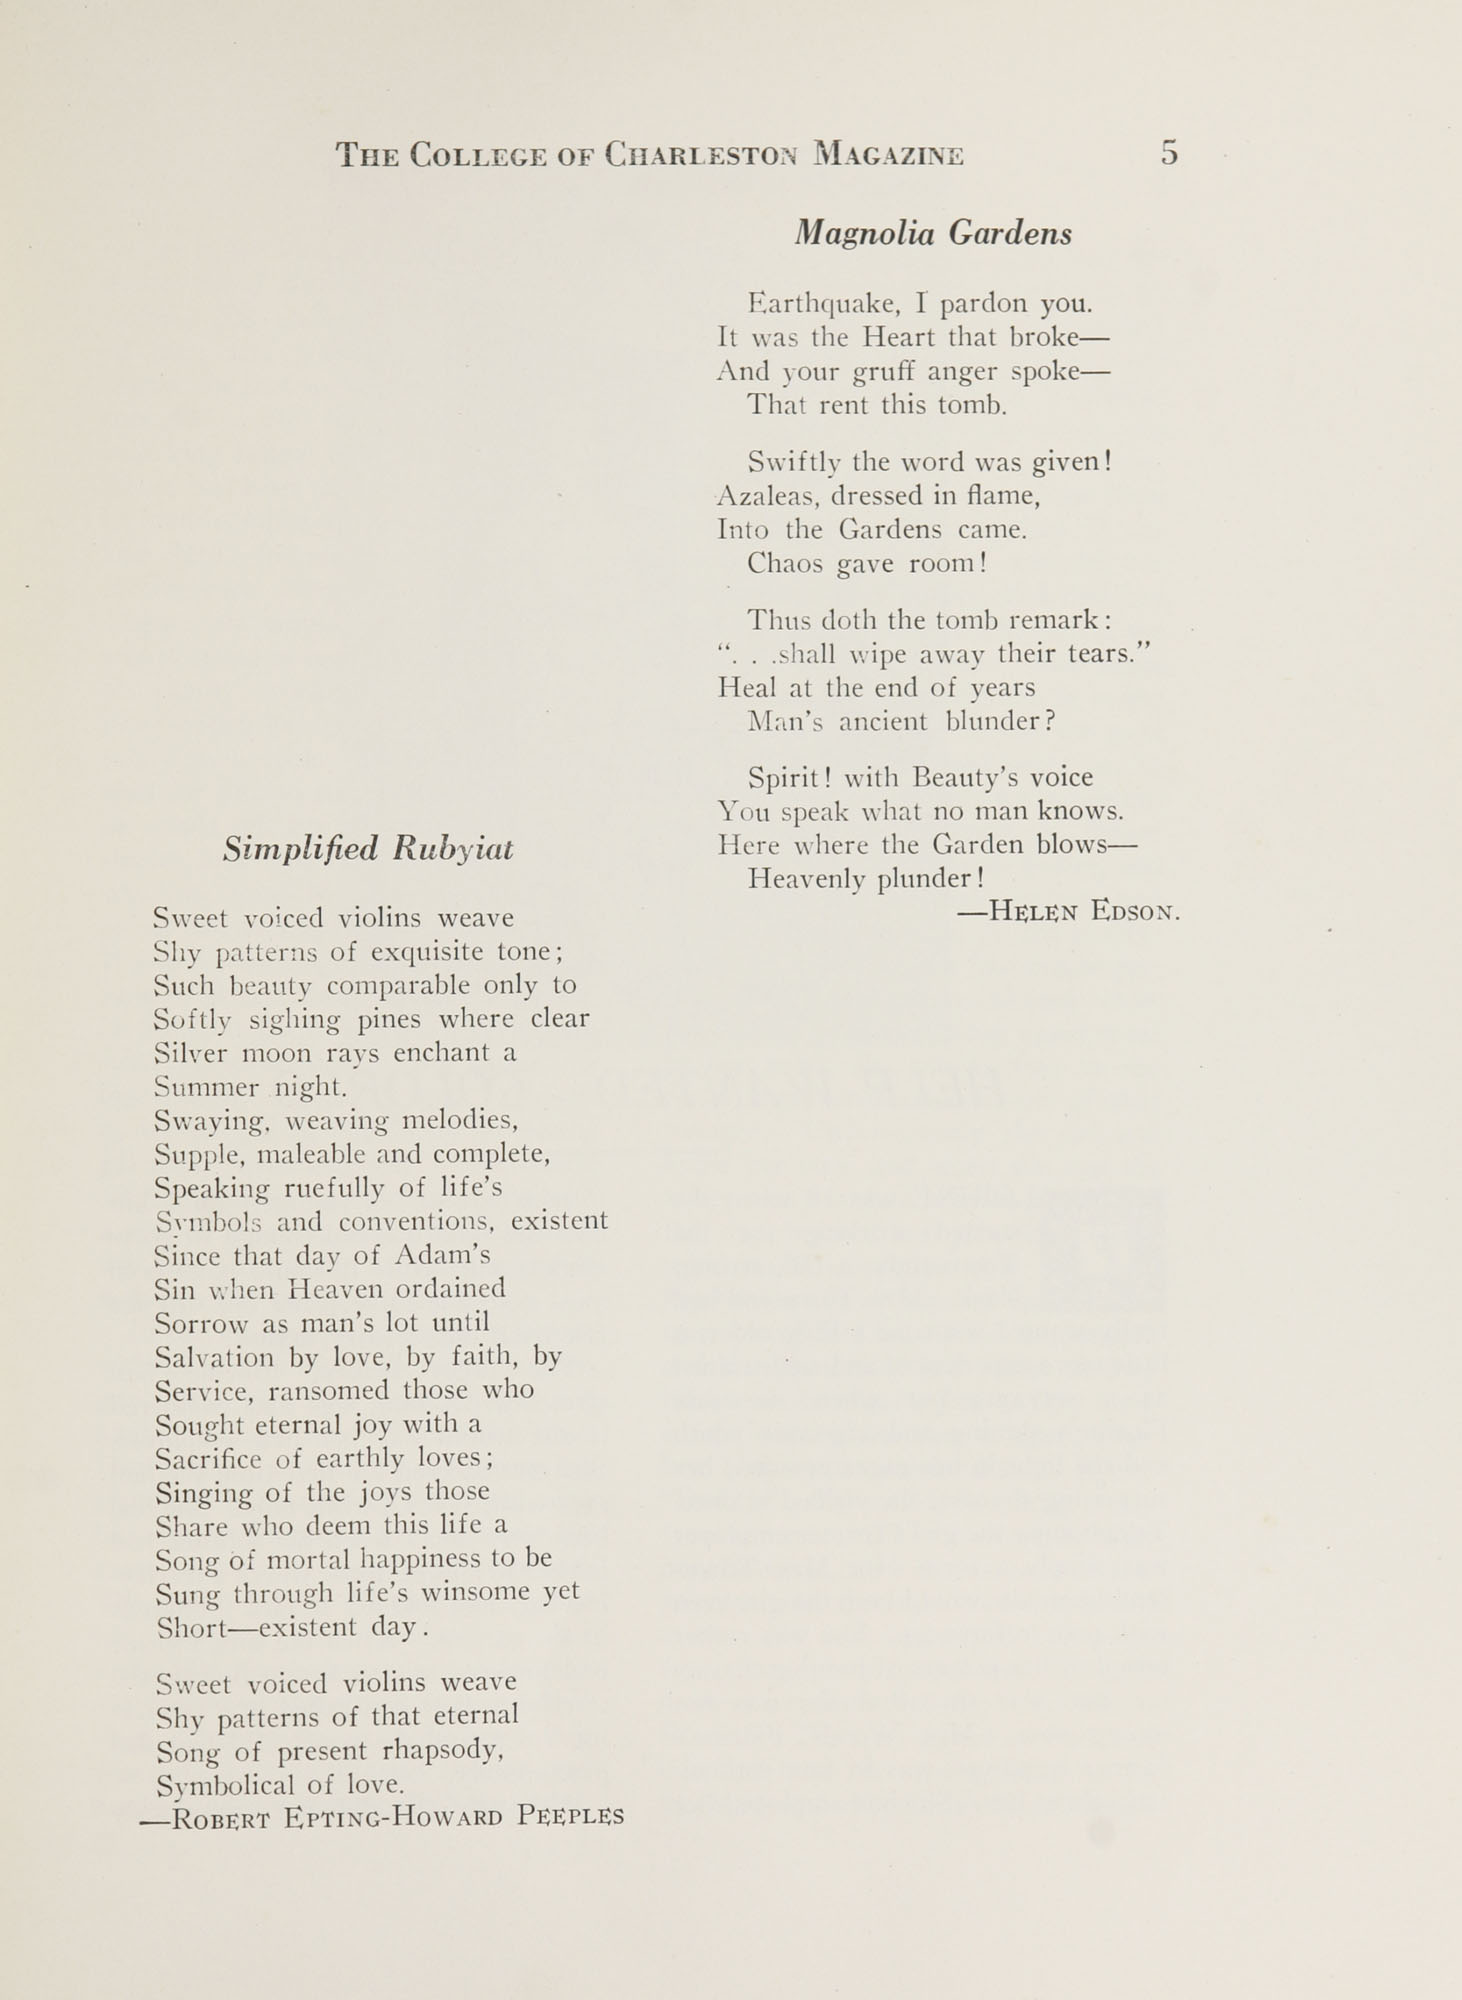 College of Charleston Magazine, 1937-1938, Vol. XXXXI No. 2, page 5